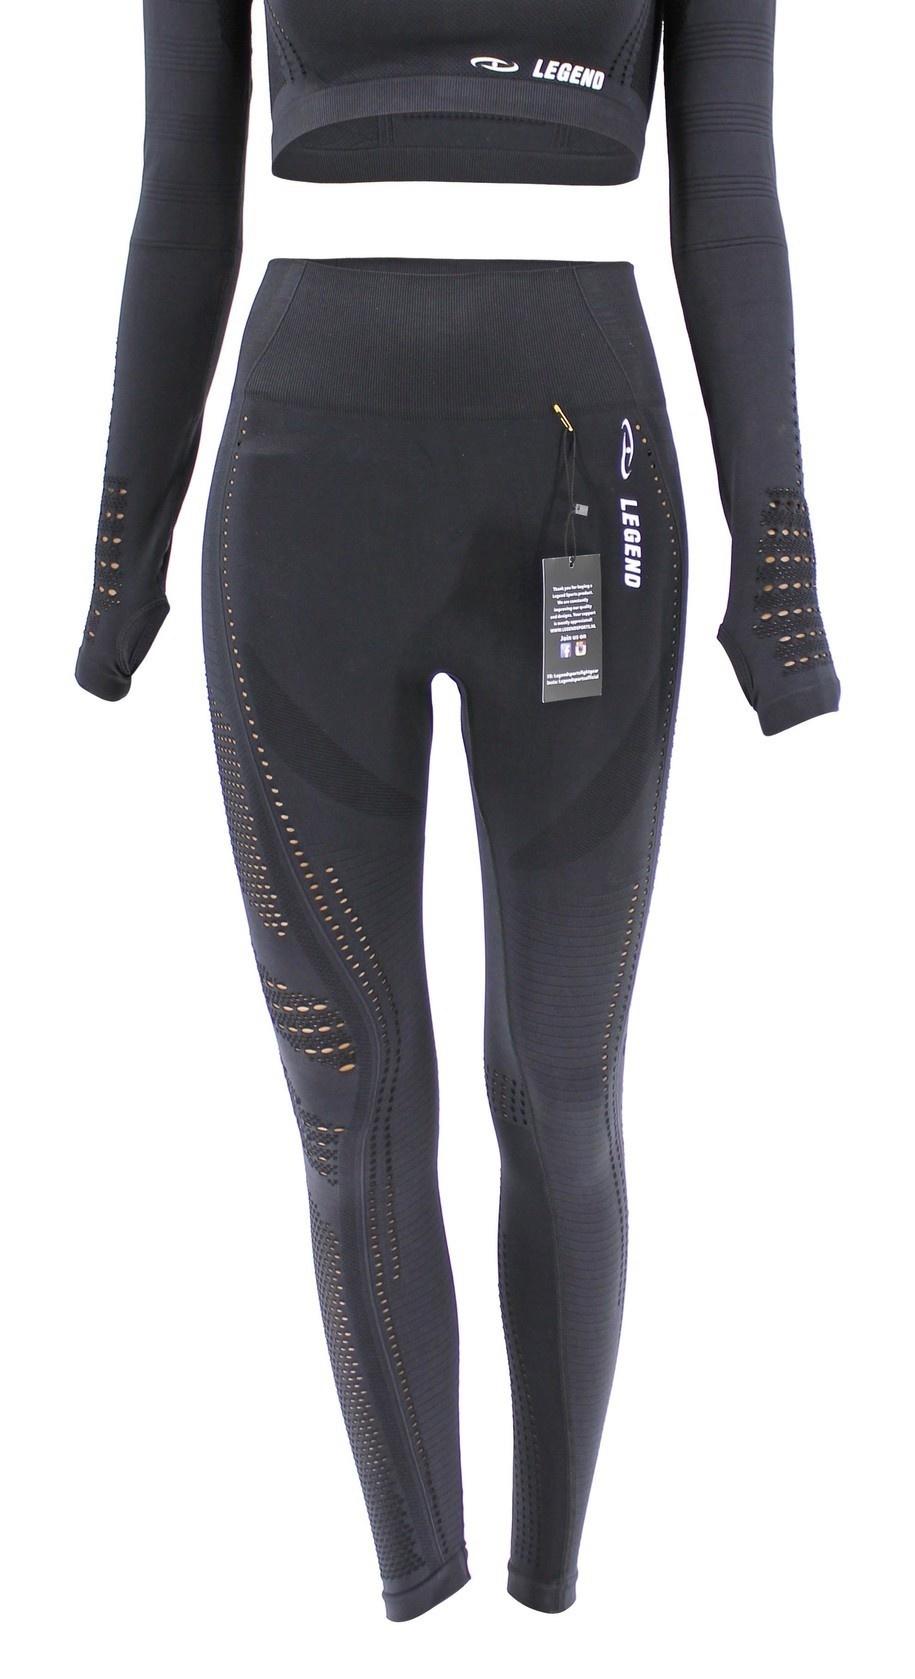 Sport Legging Black mesh Pro